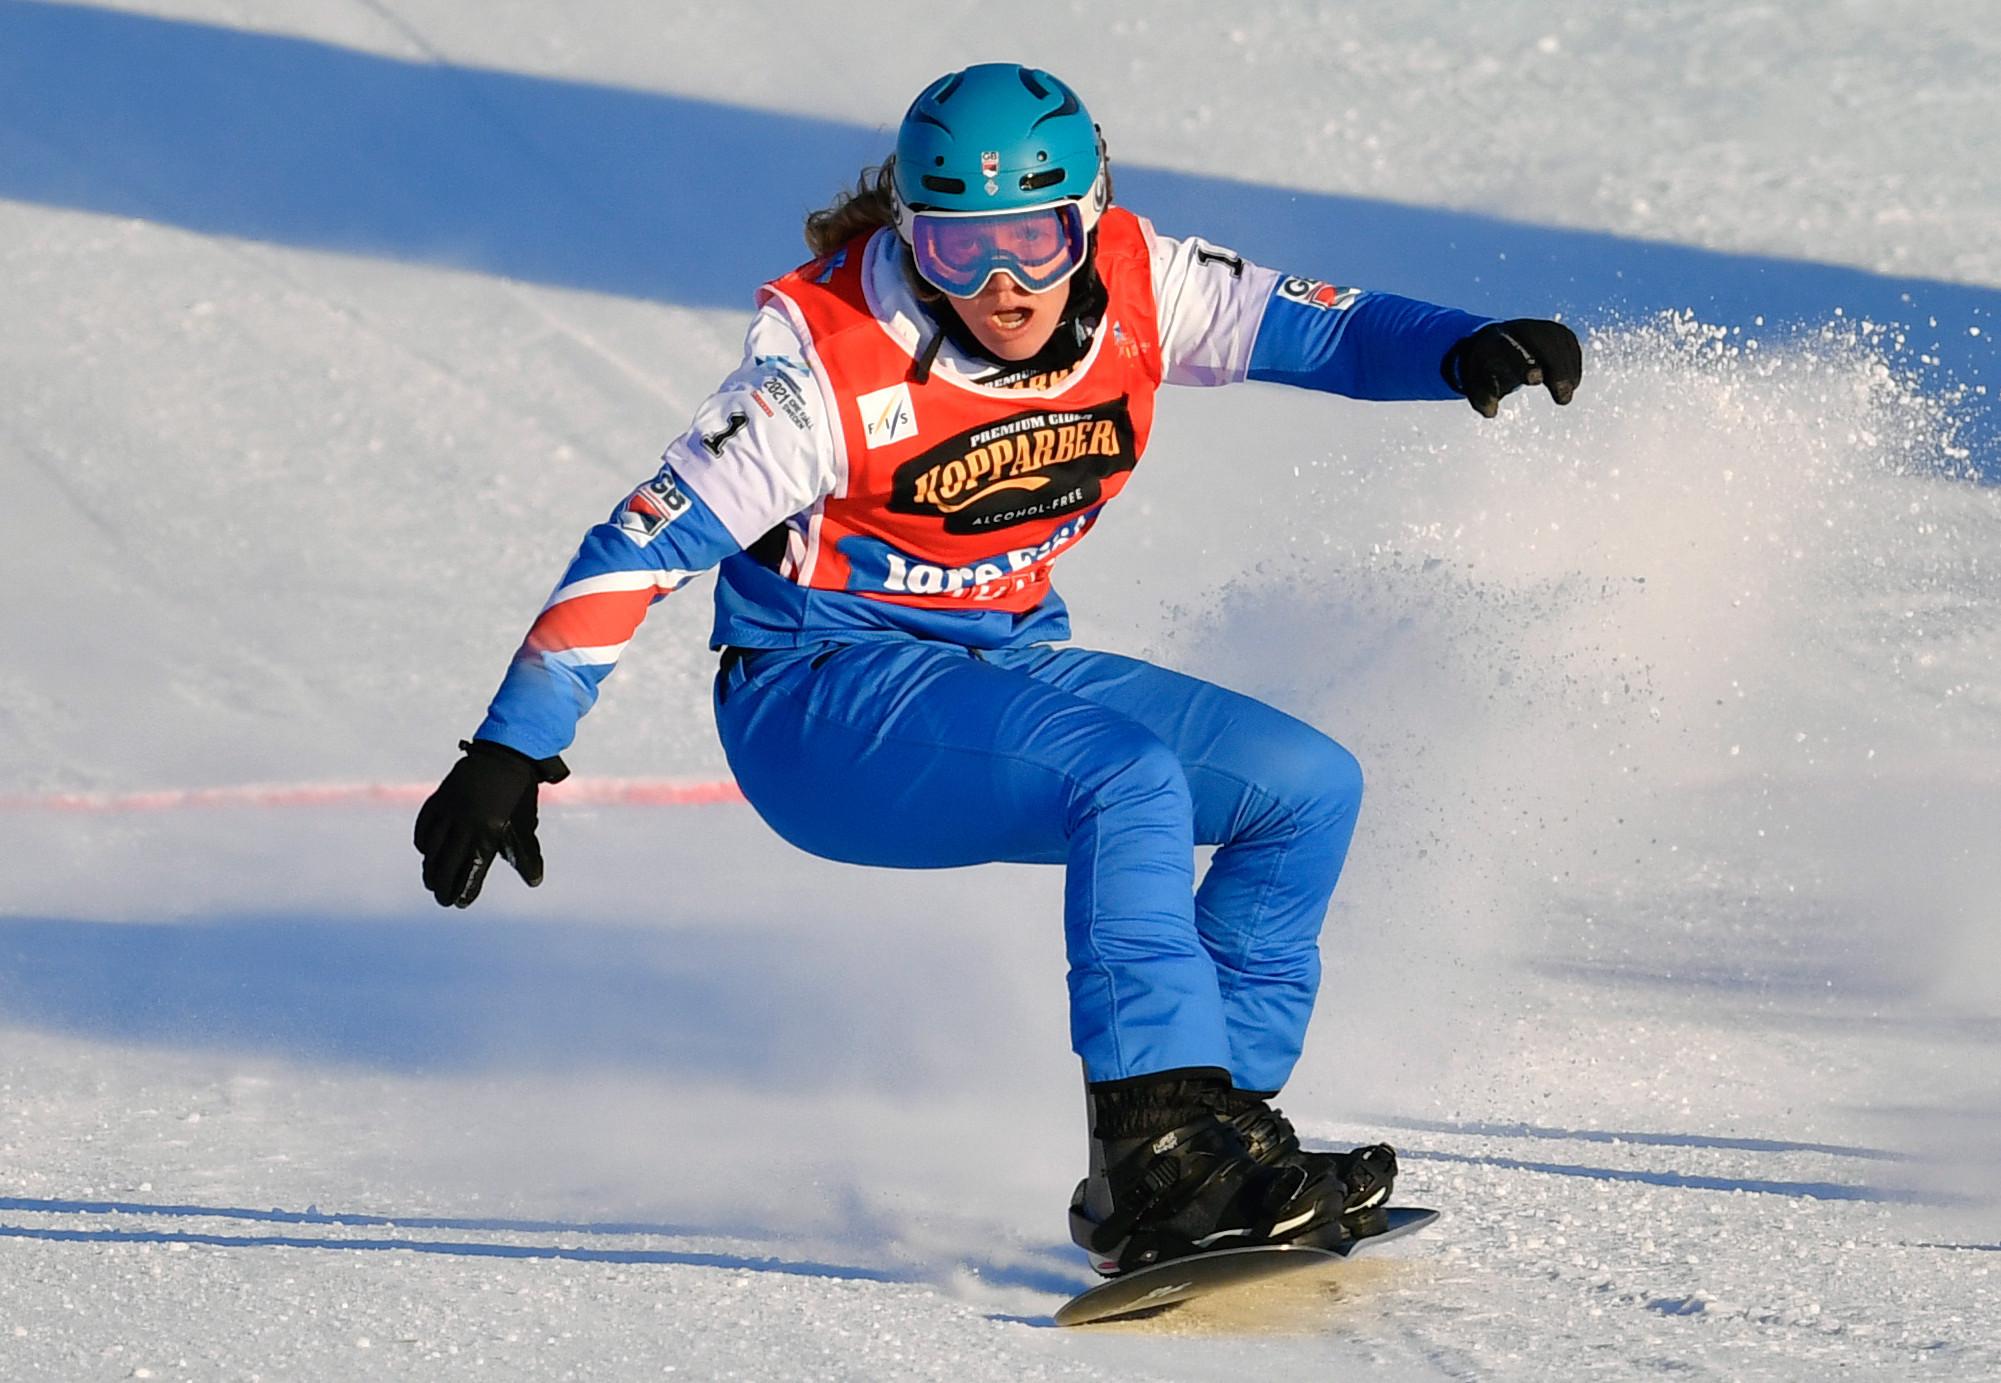 World champion Bankes headlines Britain's freestyle skiing, freeski and snowboard squads